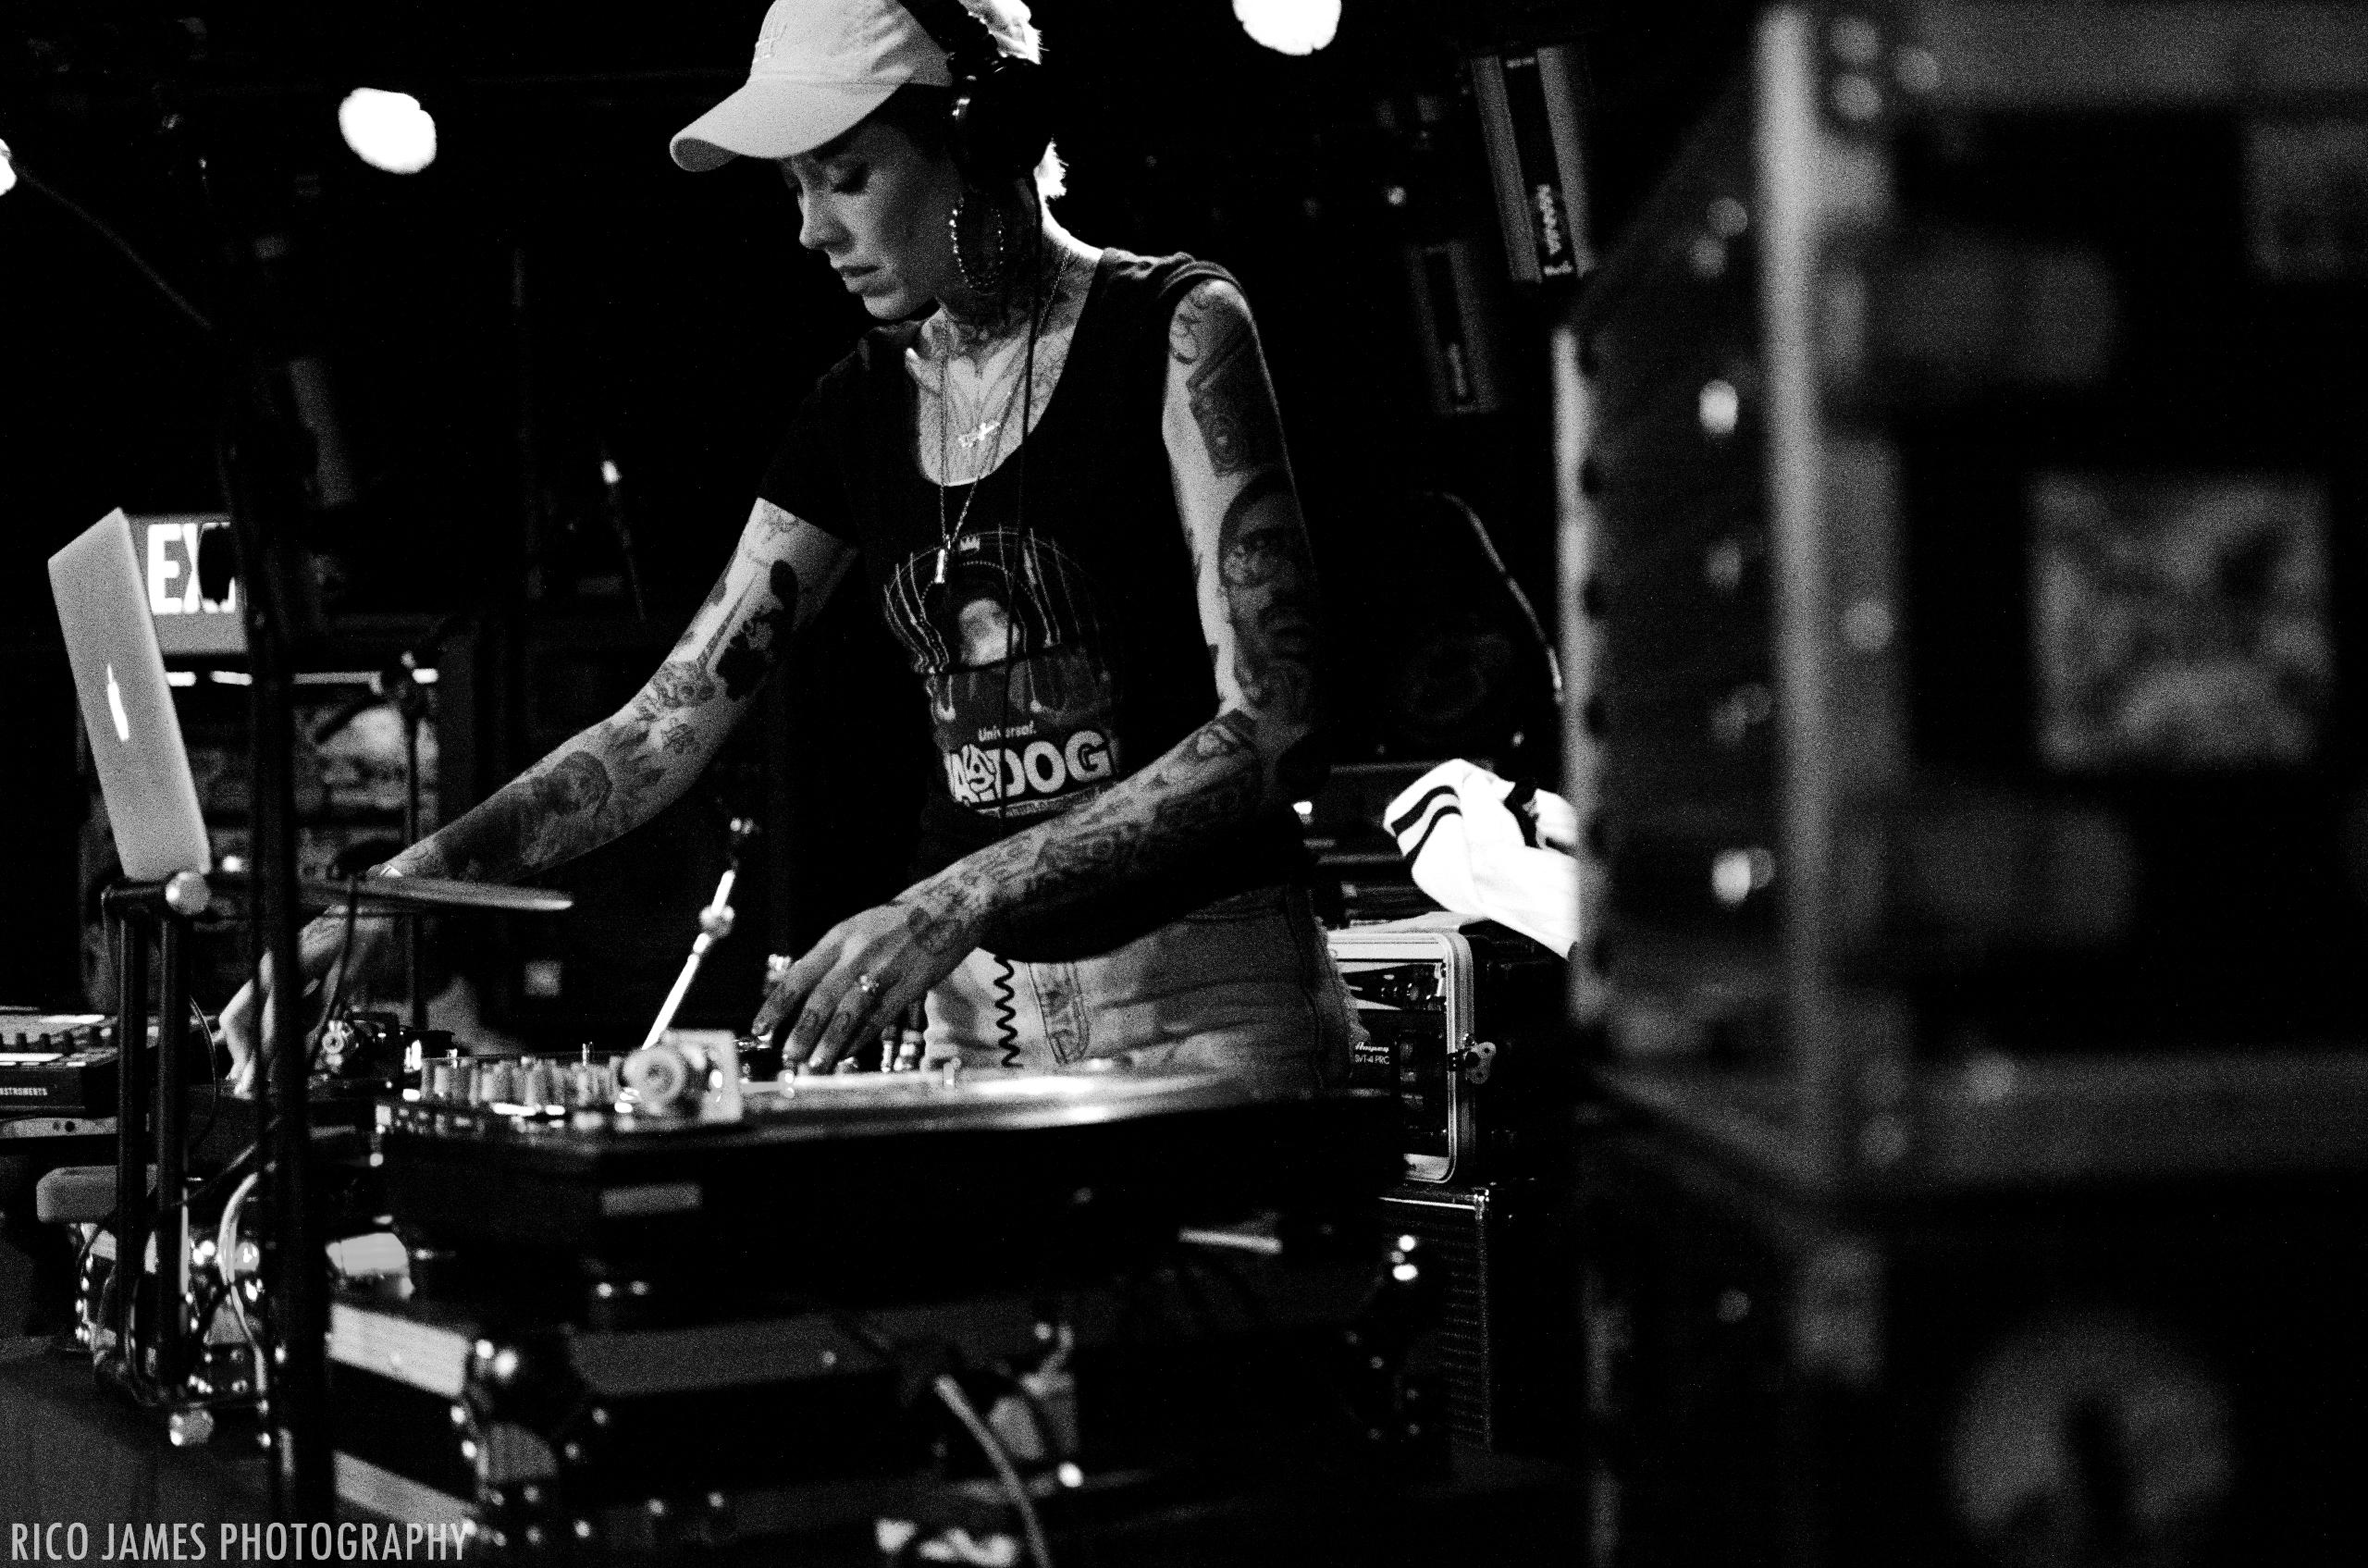 DJ Ry Toast | A_Dog Day 2017 - ricojames | ello